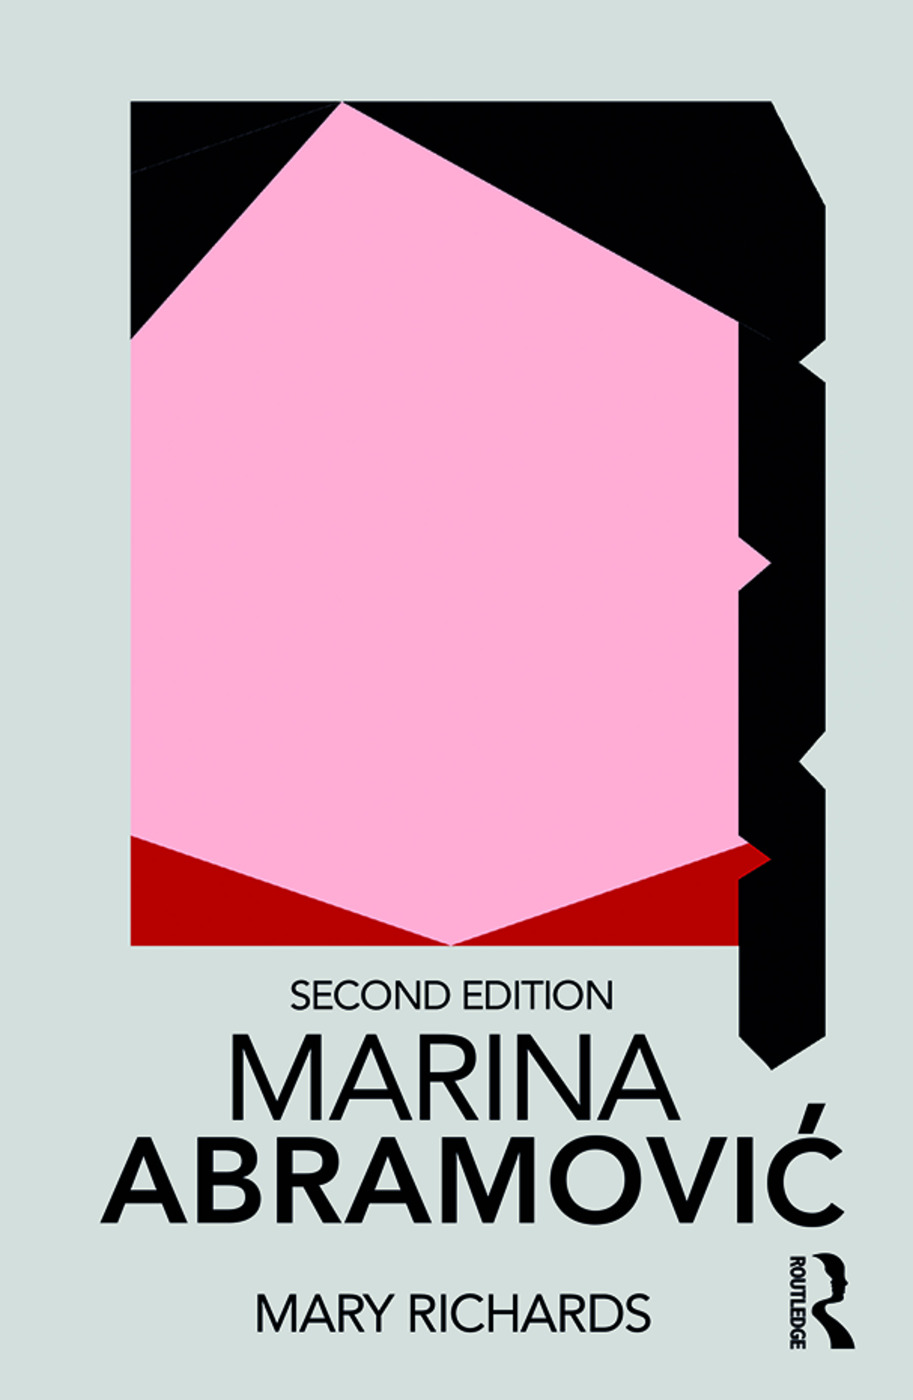 Marina Abramović book cover